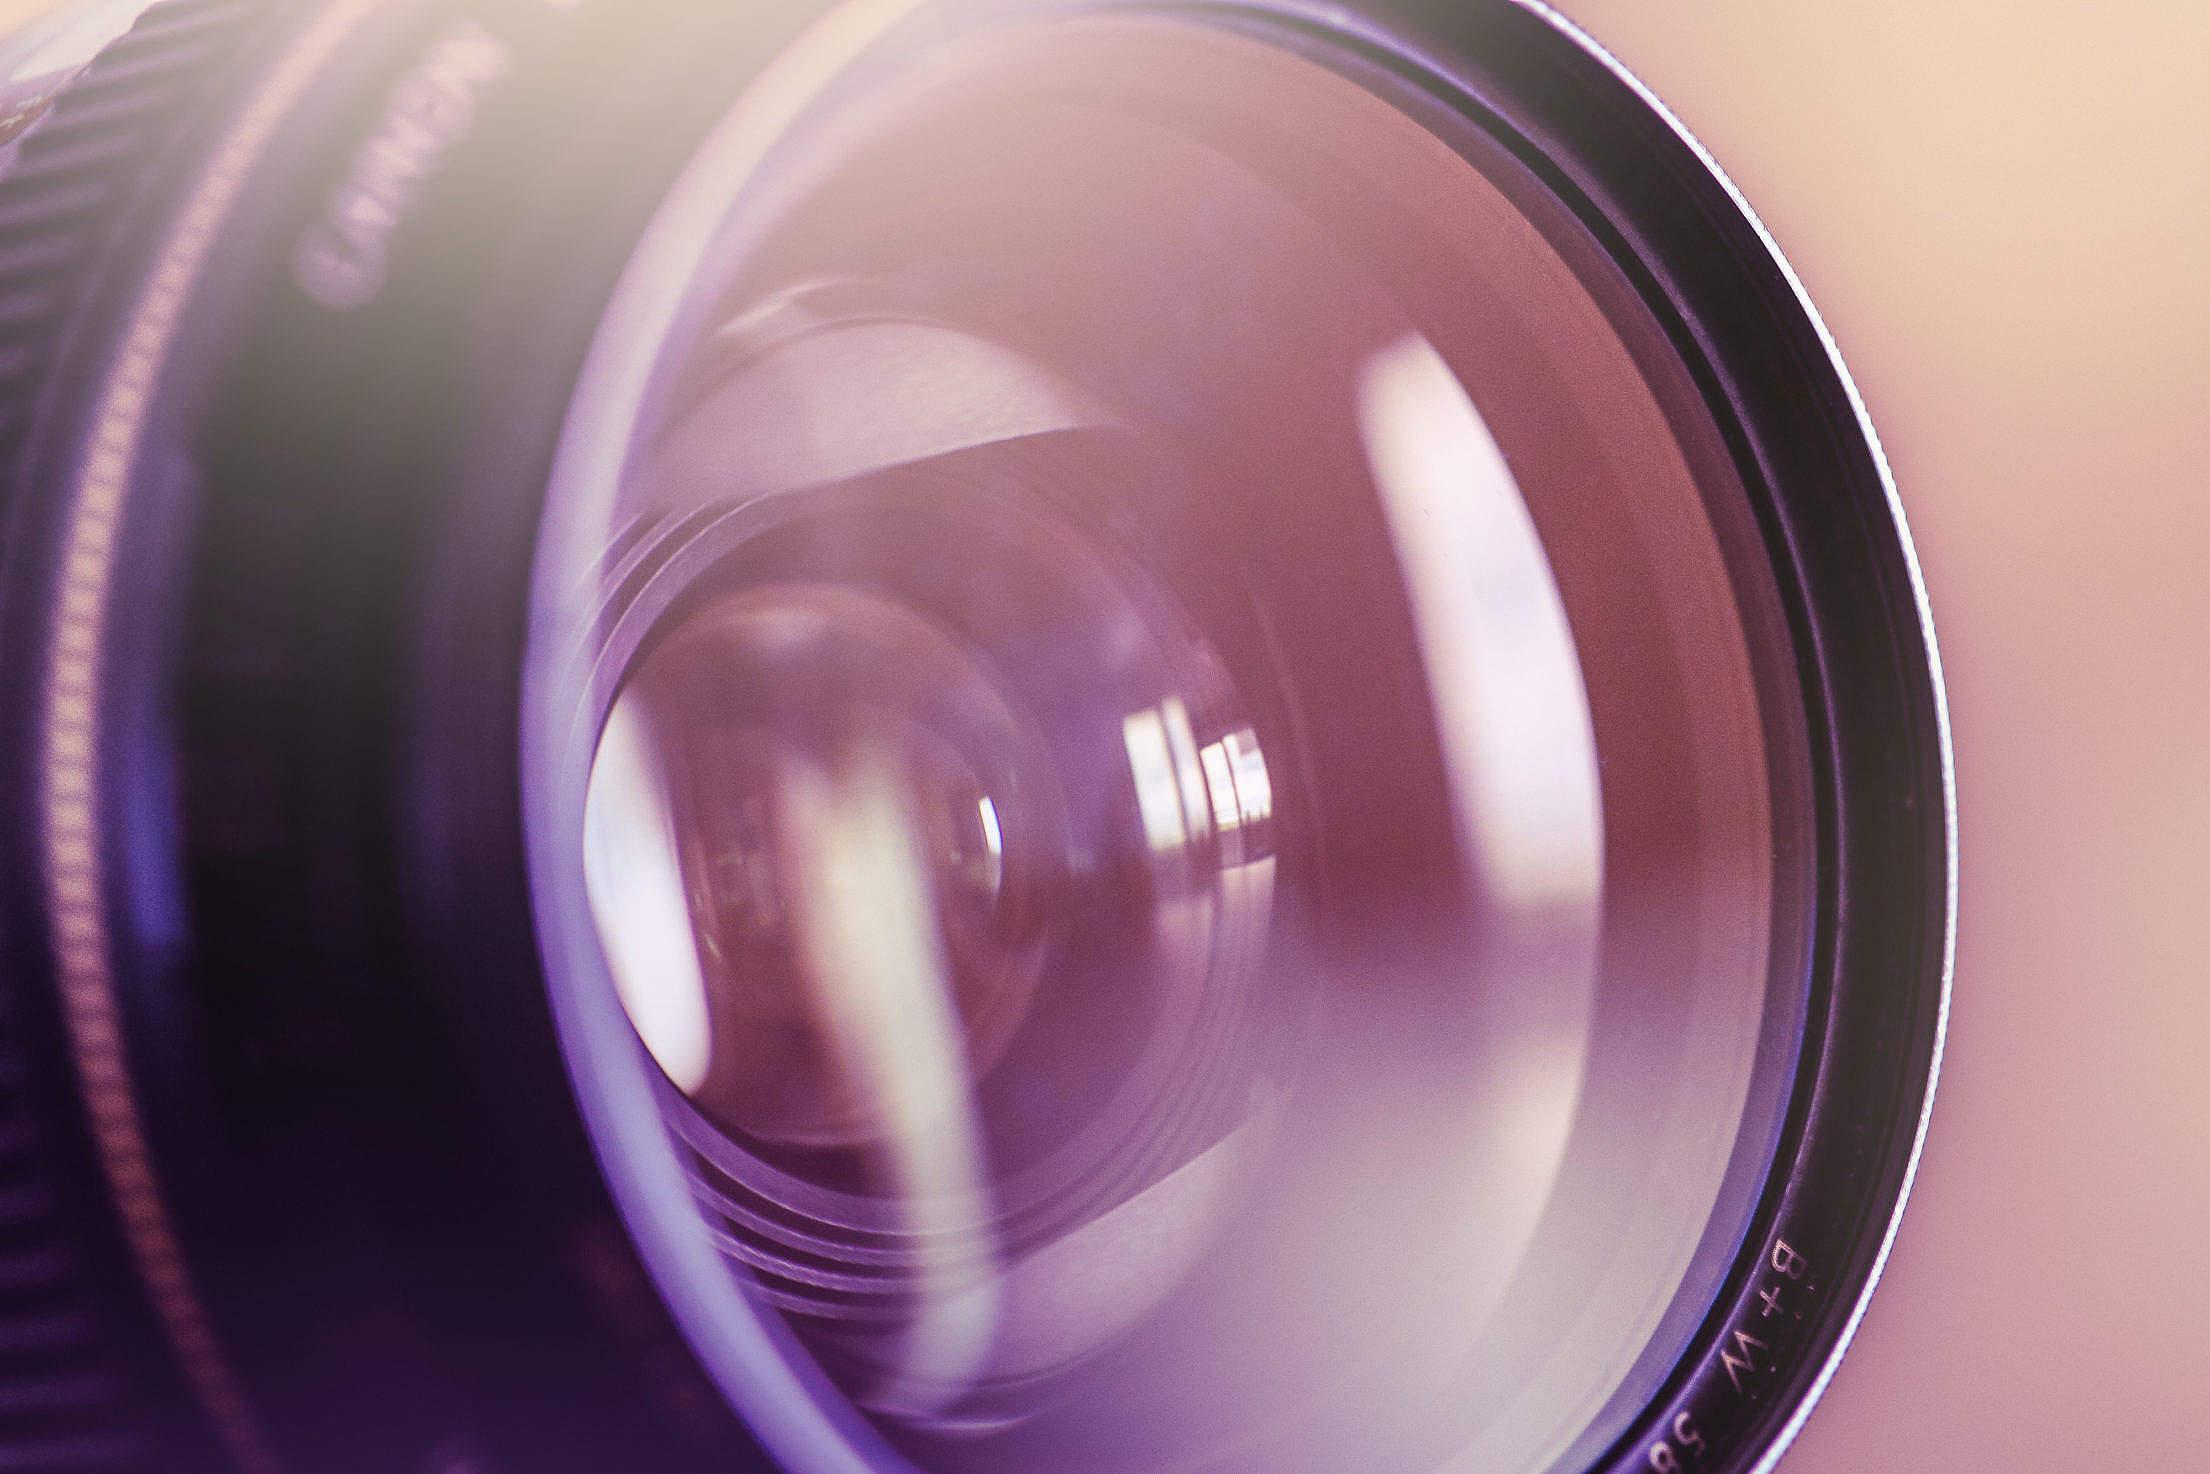 Colorful DSLR Lens Close Up Free Stock Photo